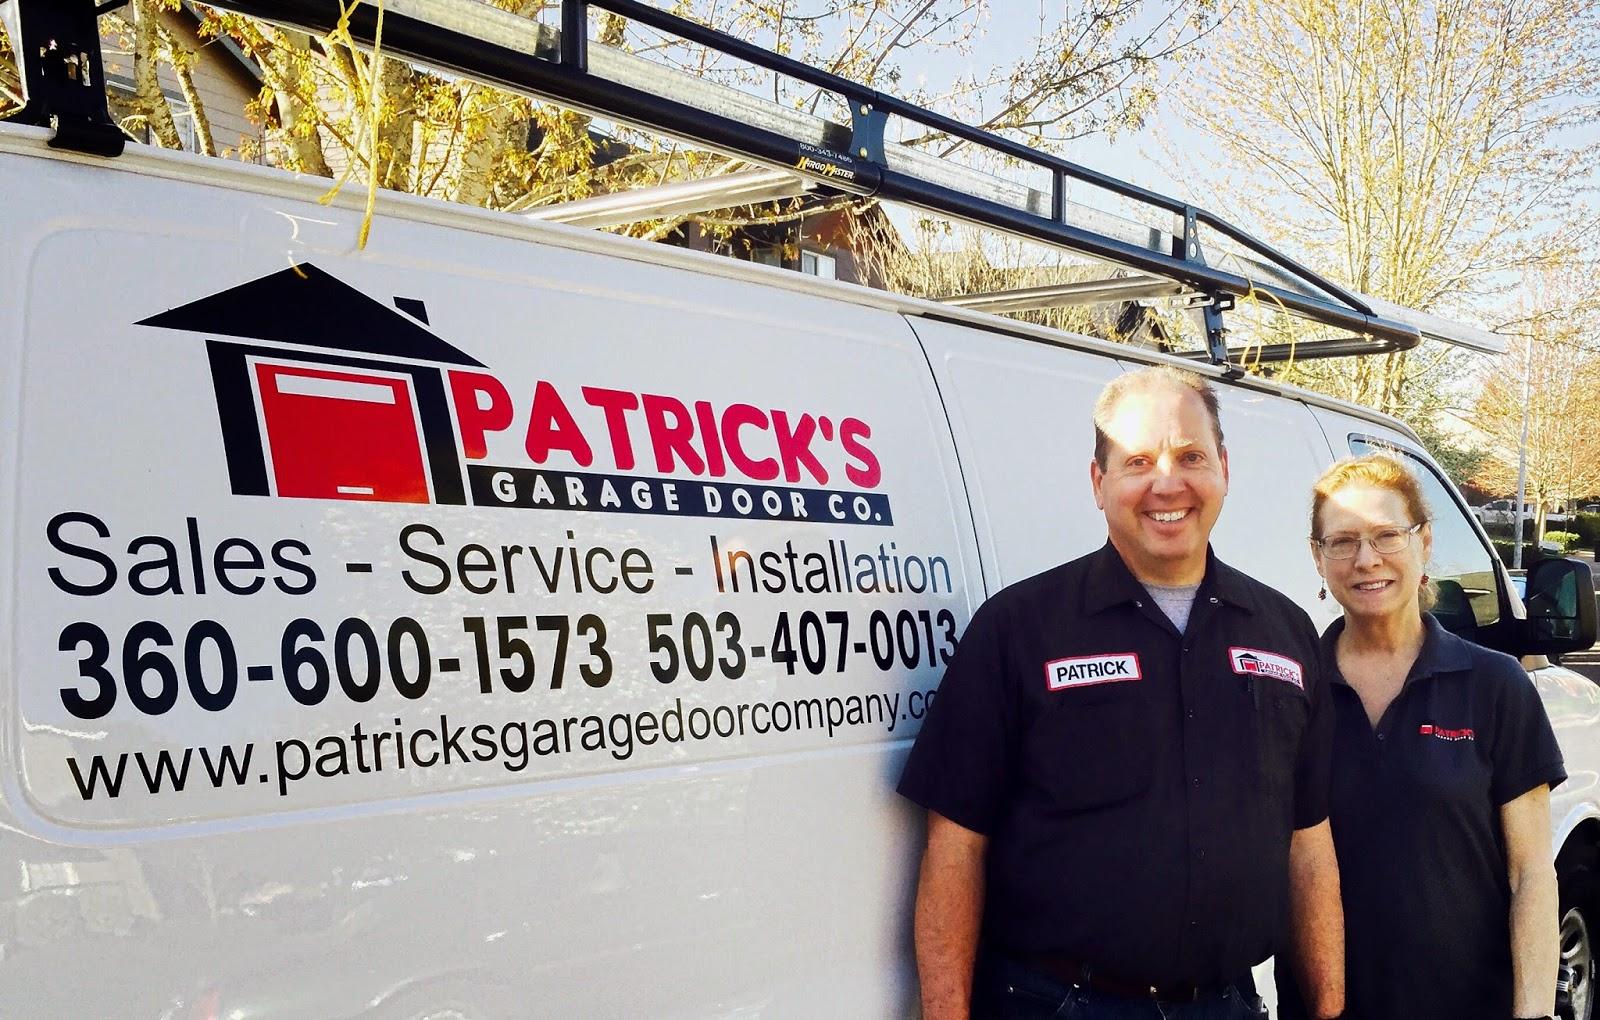 Patrick's Garage Door Company | Portland Oregon - 503.407.0013 ... on the stadium vancouver wa, the academy vancouver wa, the garage bremerton wa,